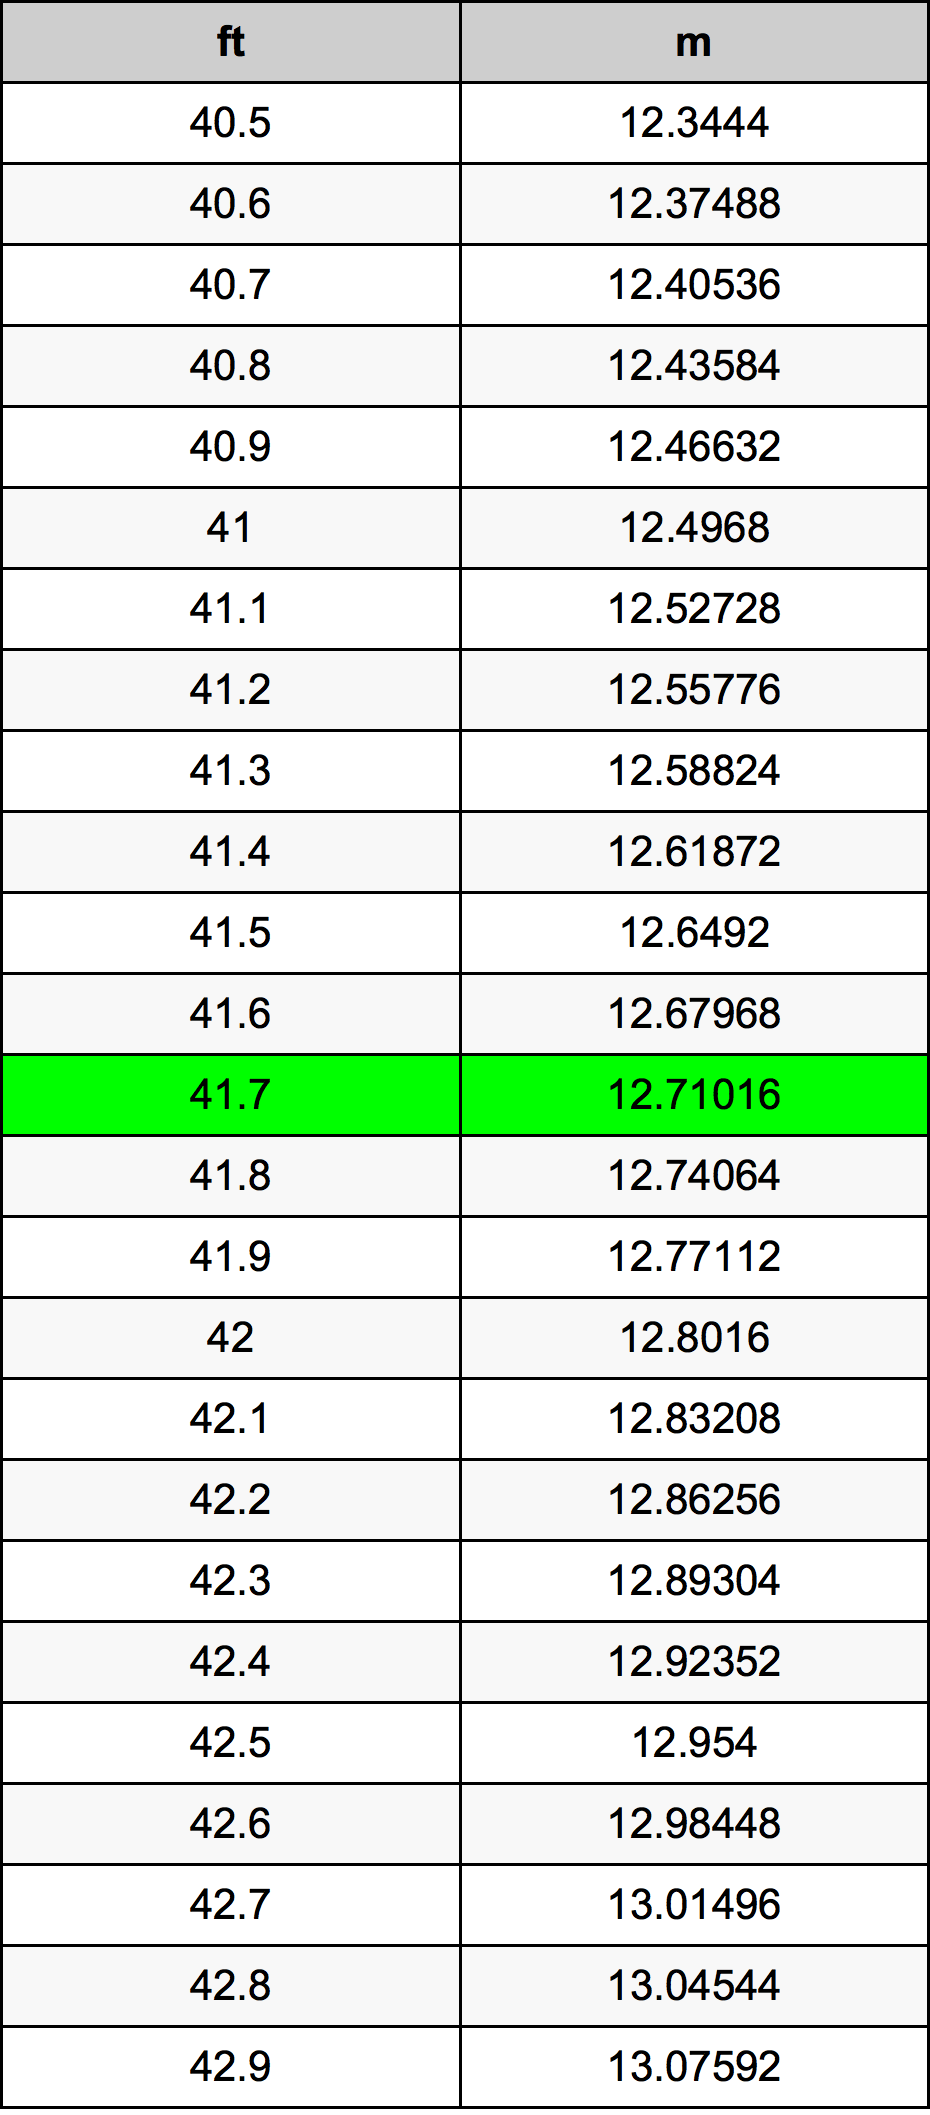 41 7 Feet To Metres Converter 41 7 Ft To M Converter